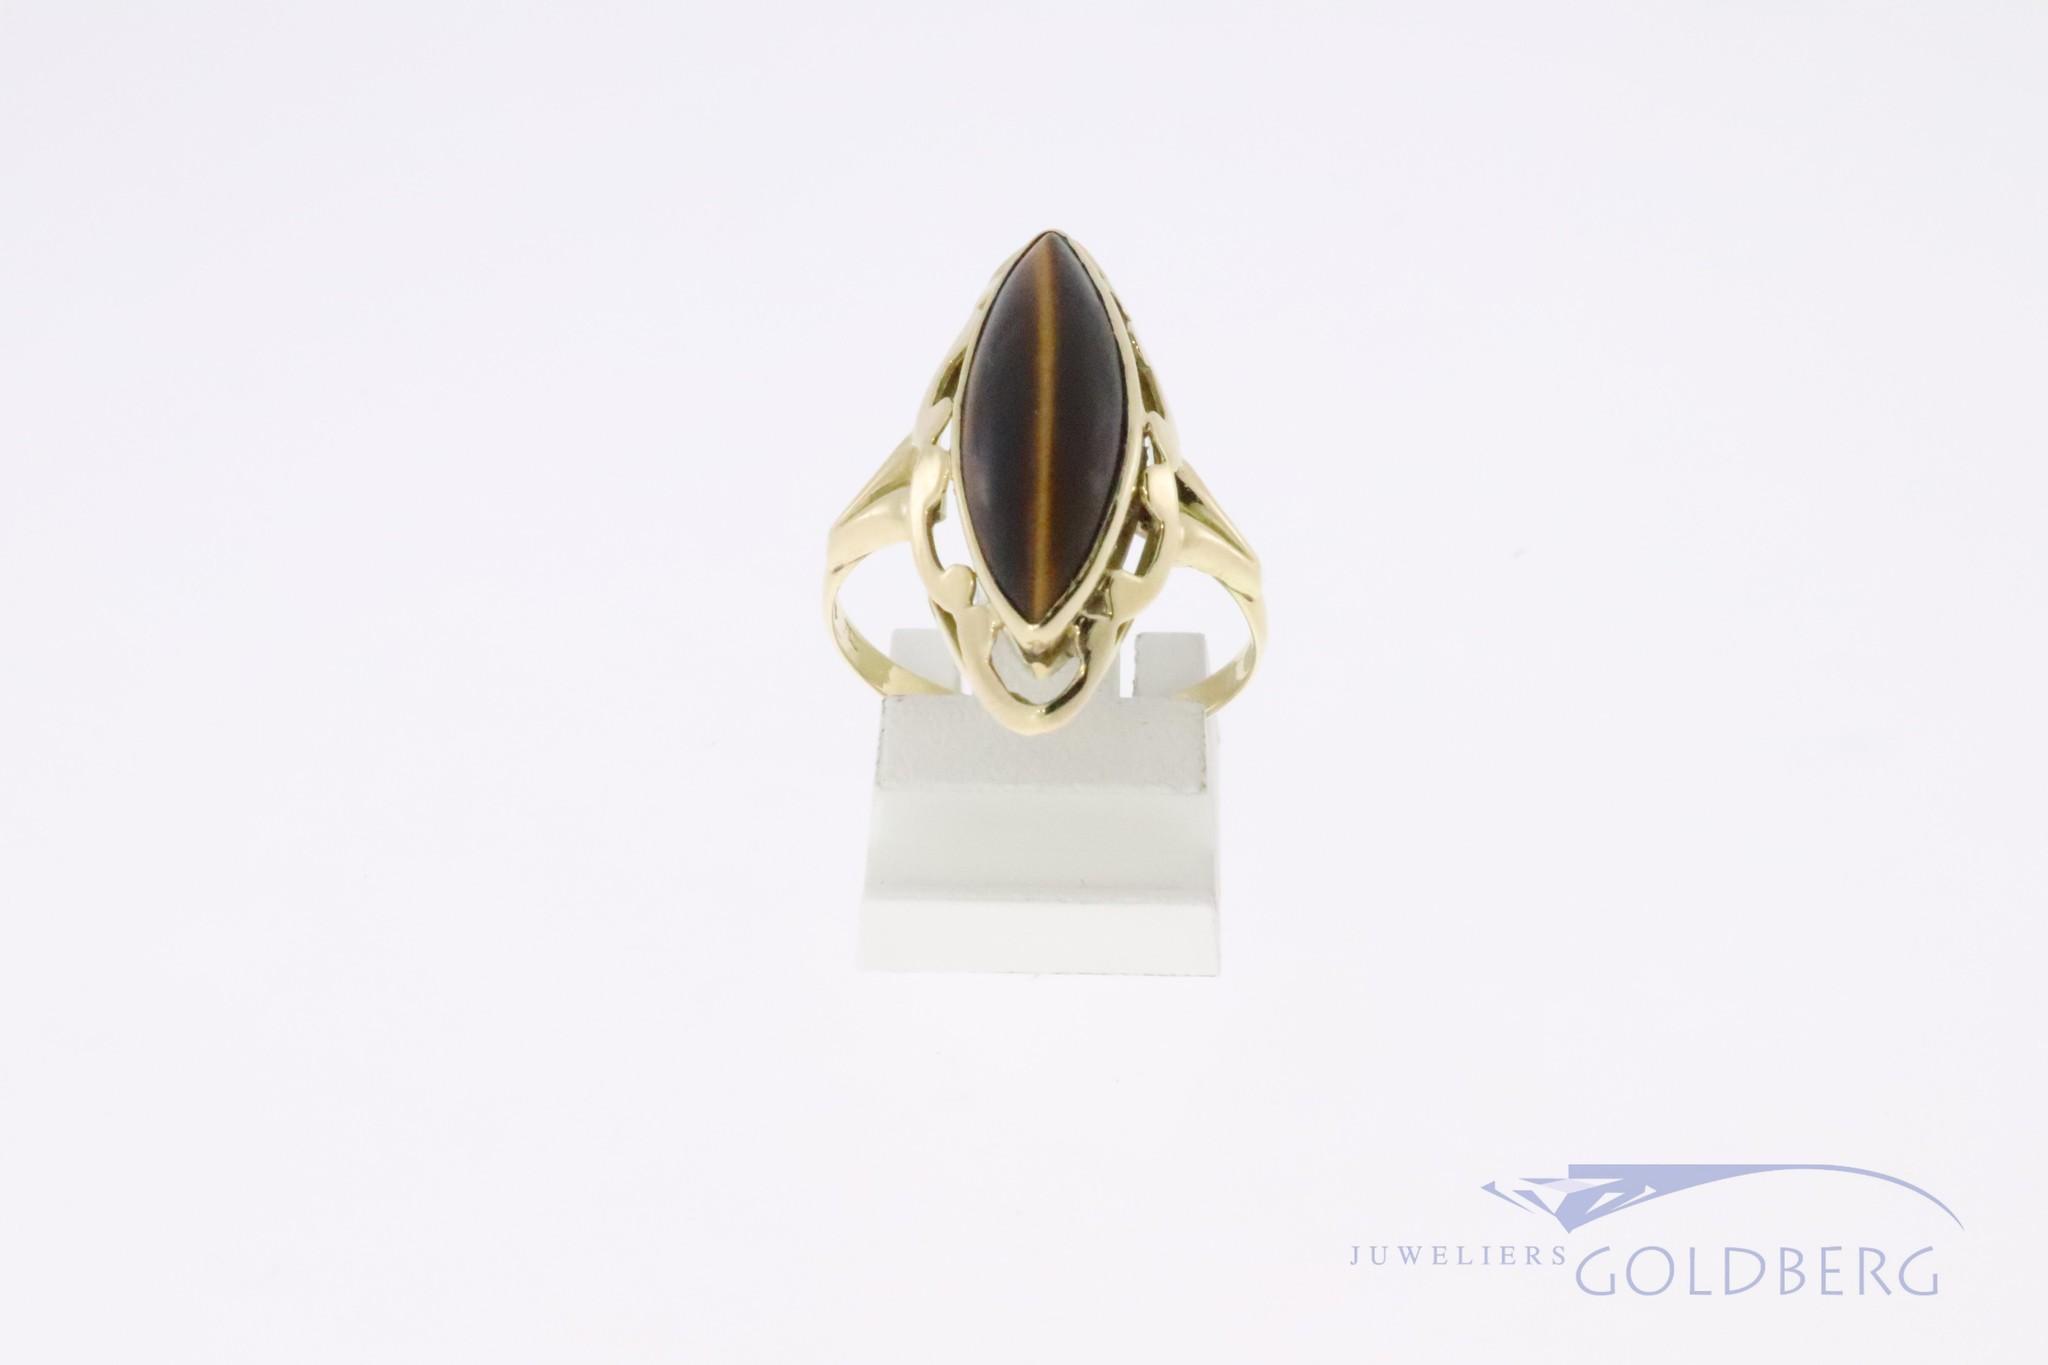 14k gold vintage ring with a cateyecut tigereye